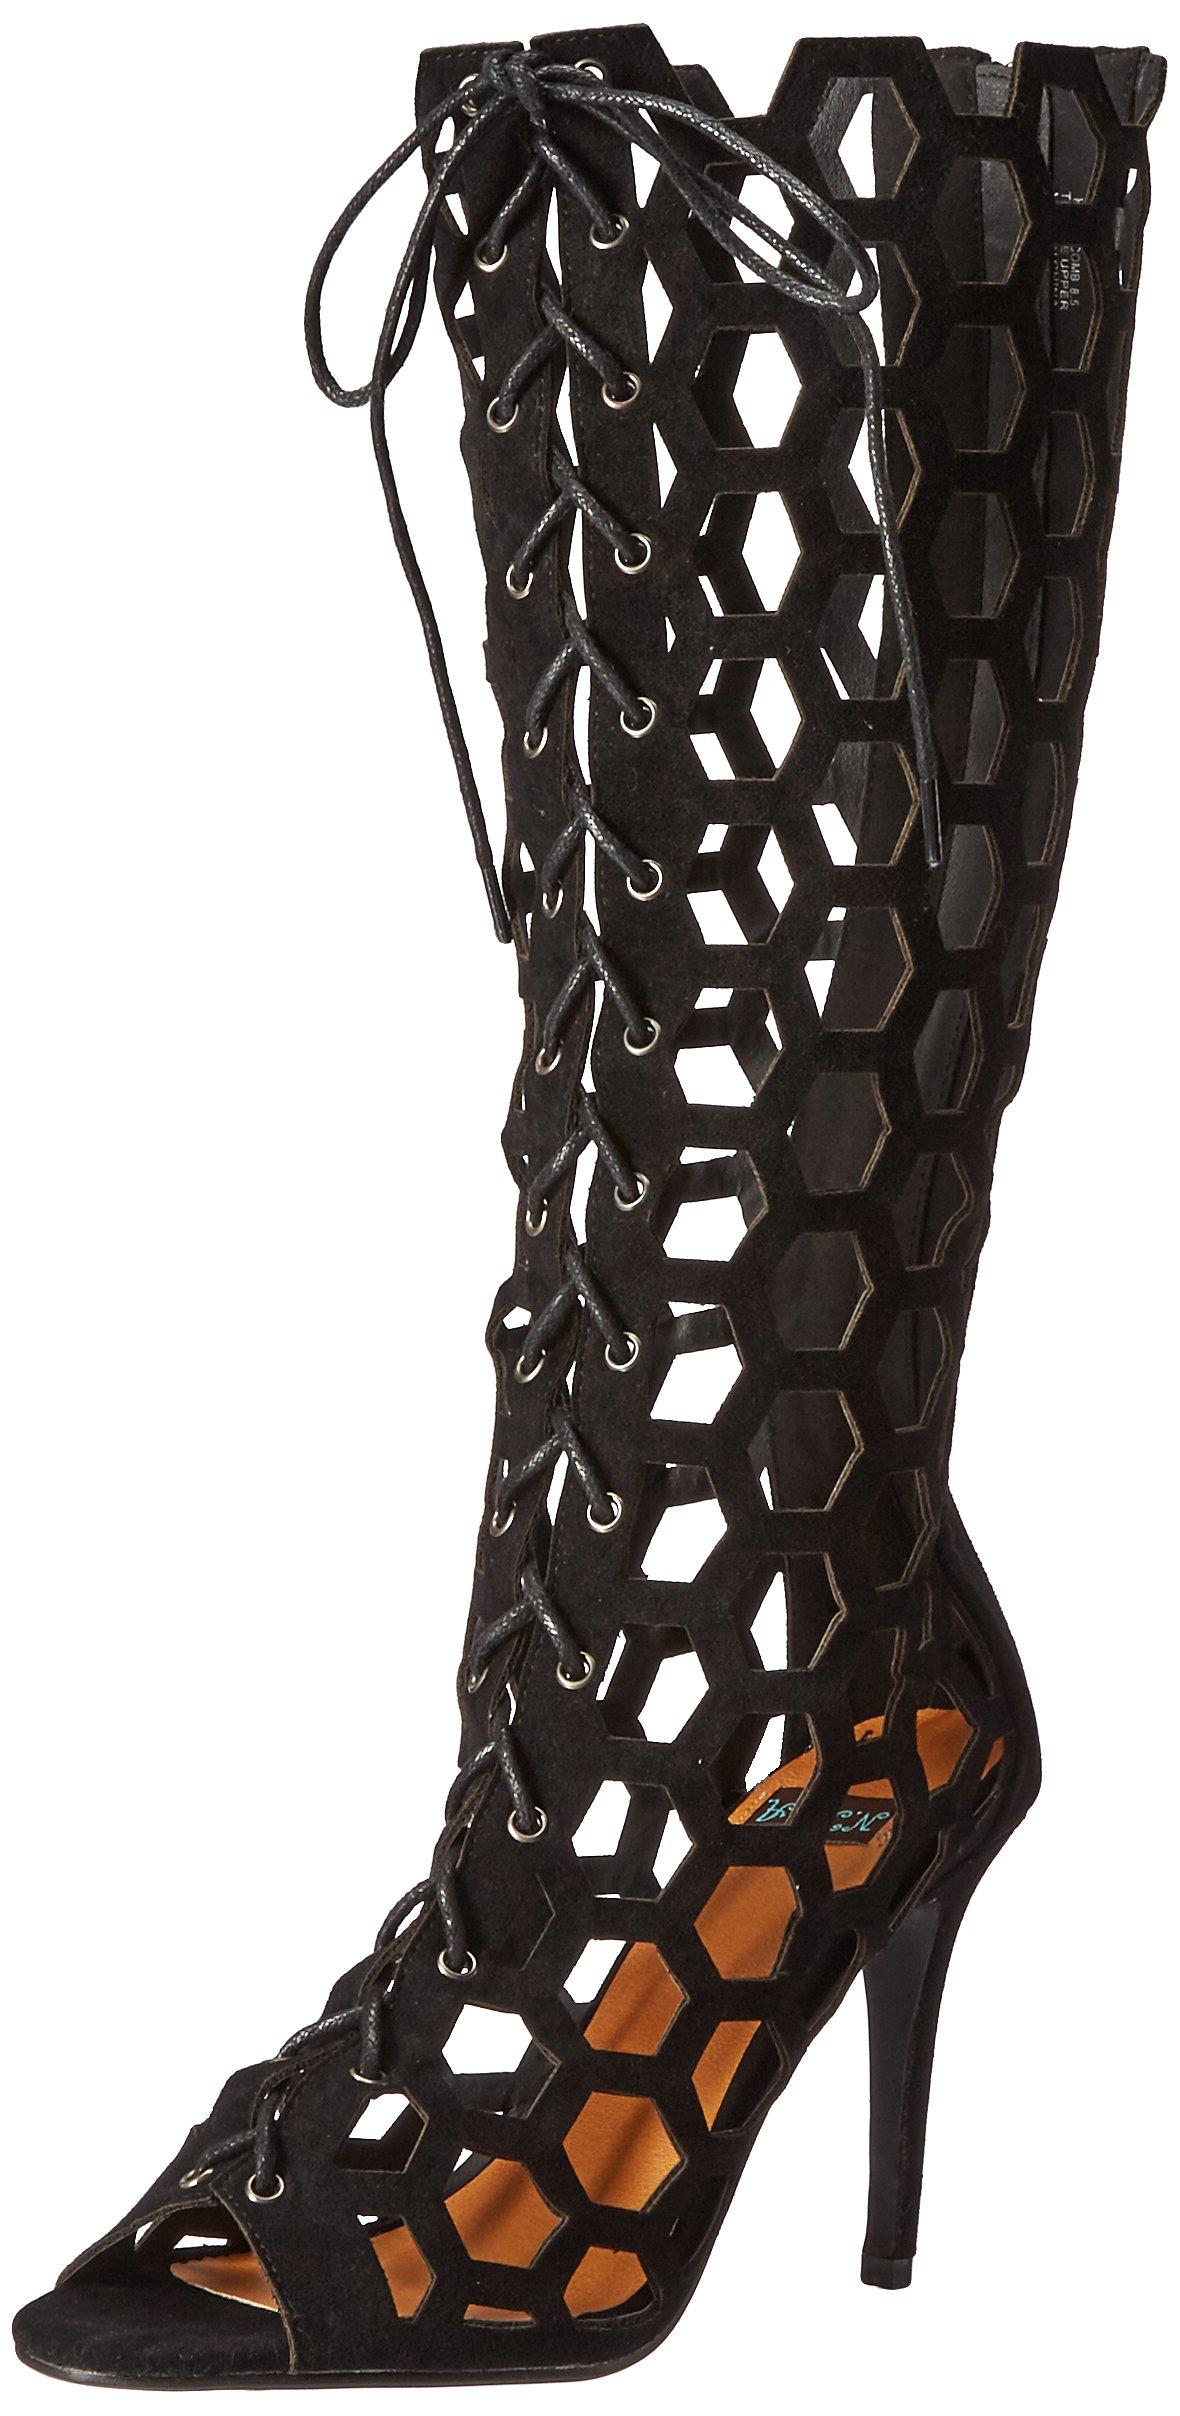 N.Y.L.A. Women's Honeycomb Dress Pump, Black, 6.5 M US